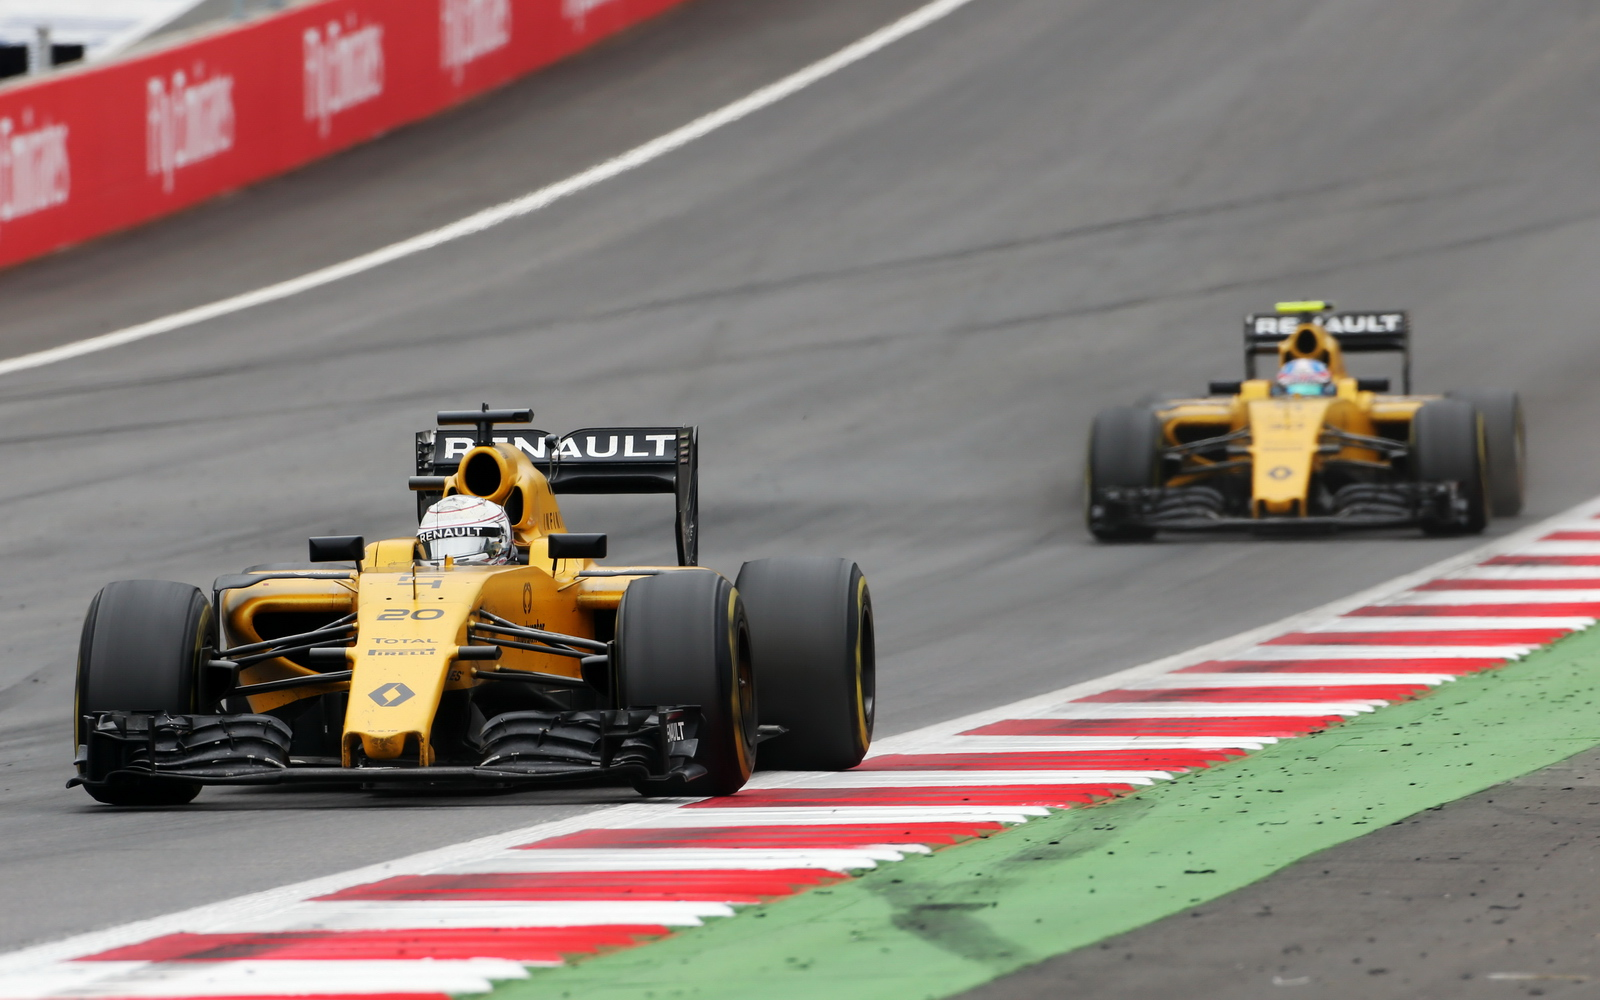 2016_austrian_gp_race_103.jpg